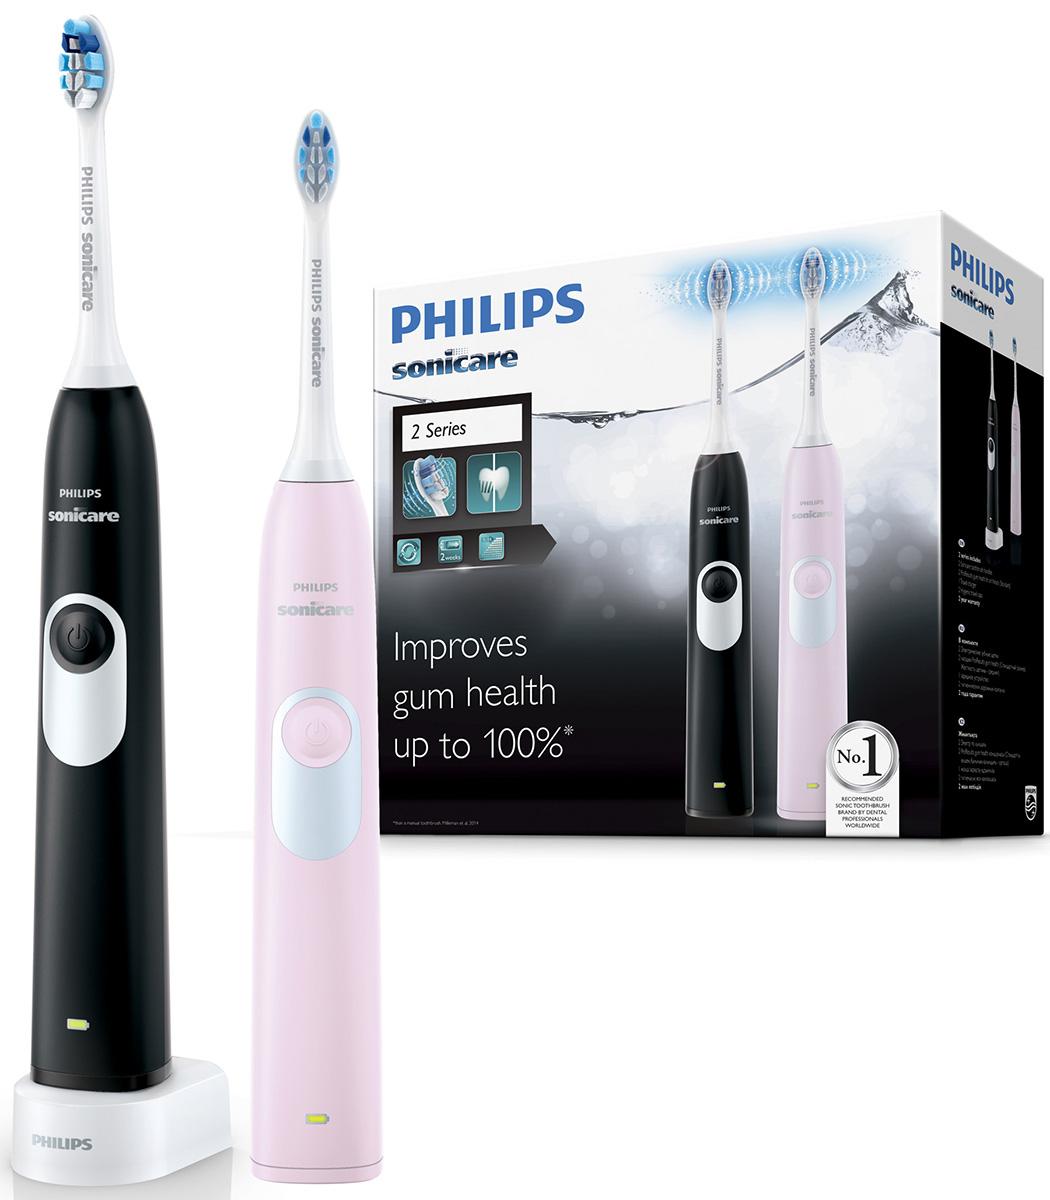 Philips Sonicare 2 Series gum health HX6232/41 набор из 2 электрических зубных щеток зубная щётка philips sonicare 3 series gum health hx9368 35 розовый черный